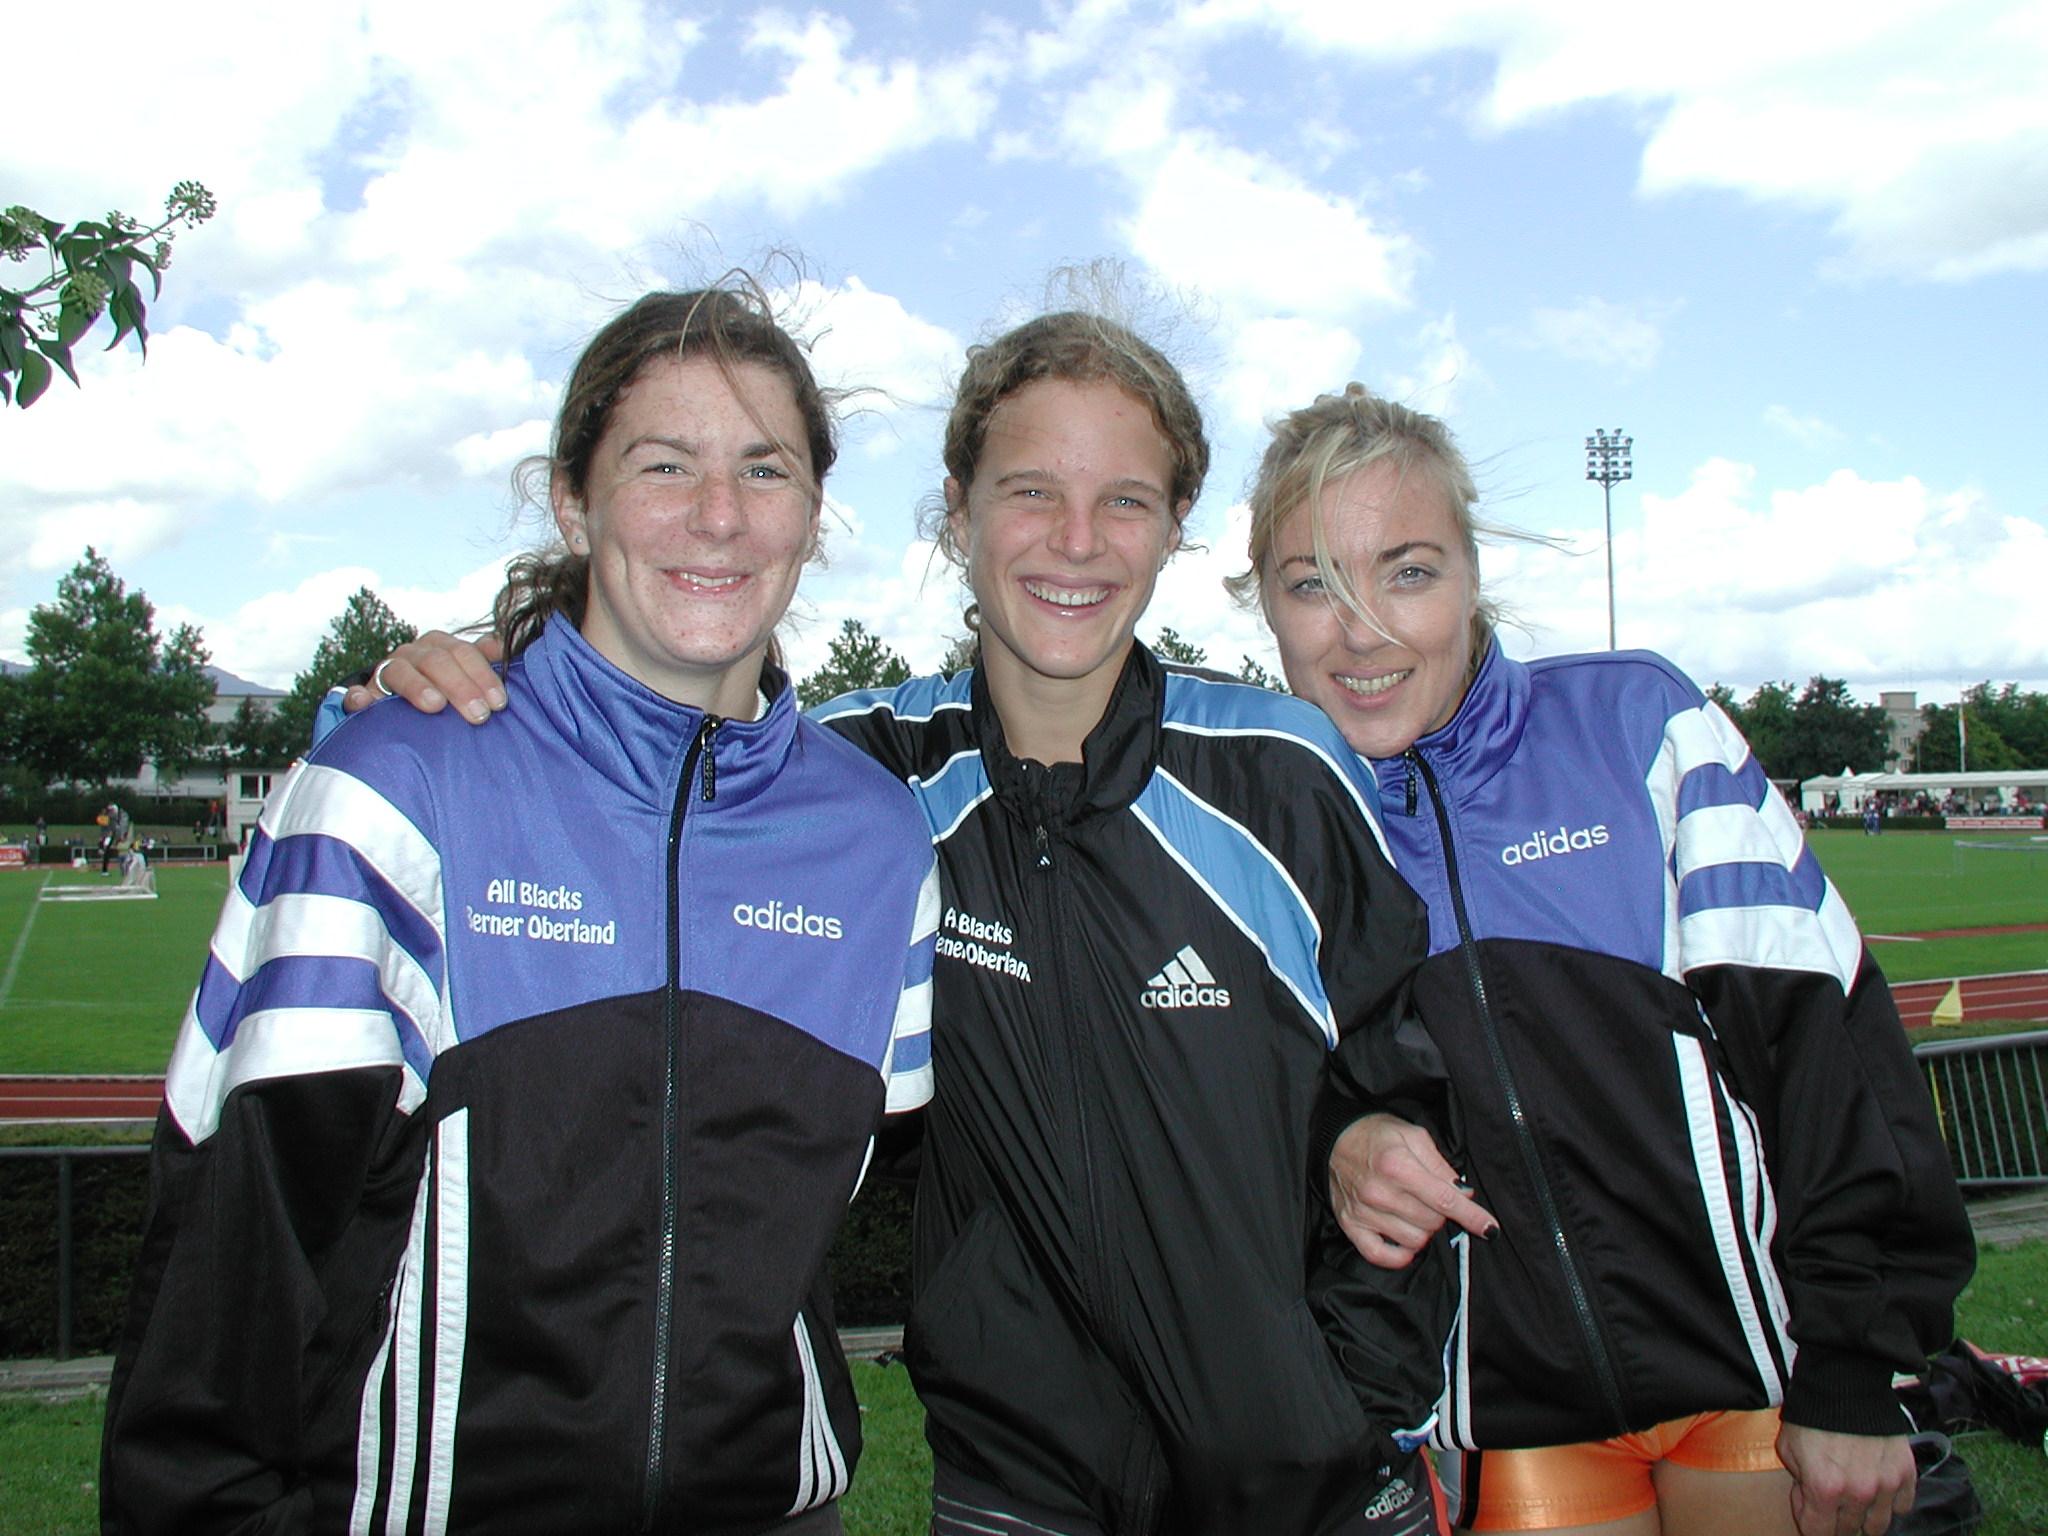 All Blacks-Staffel 3x1000m: Evelyne Jeitziner  |  Nadine Imoberdorf  |  Yvonne Rüger